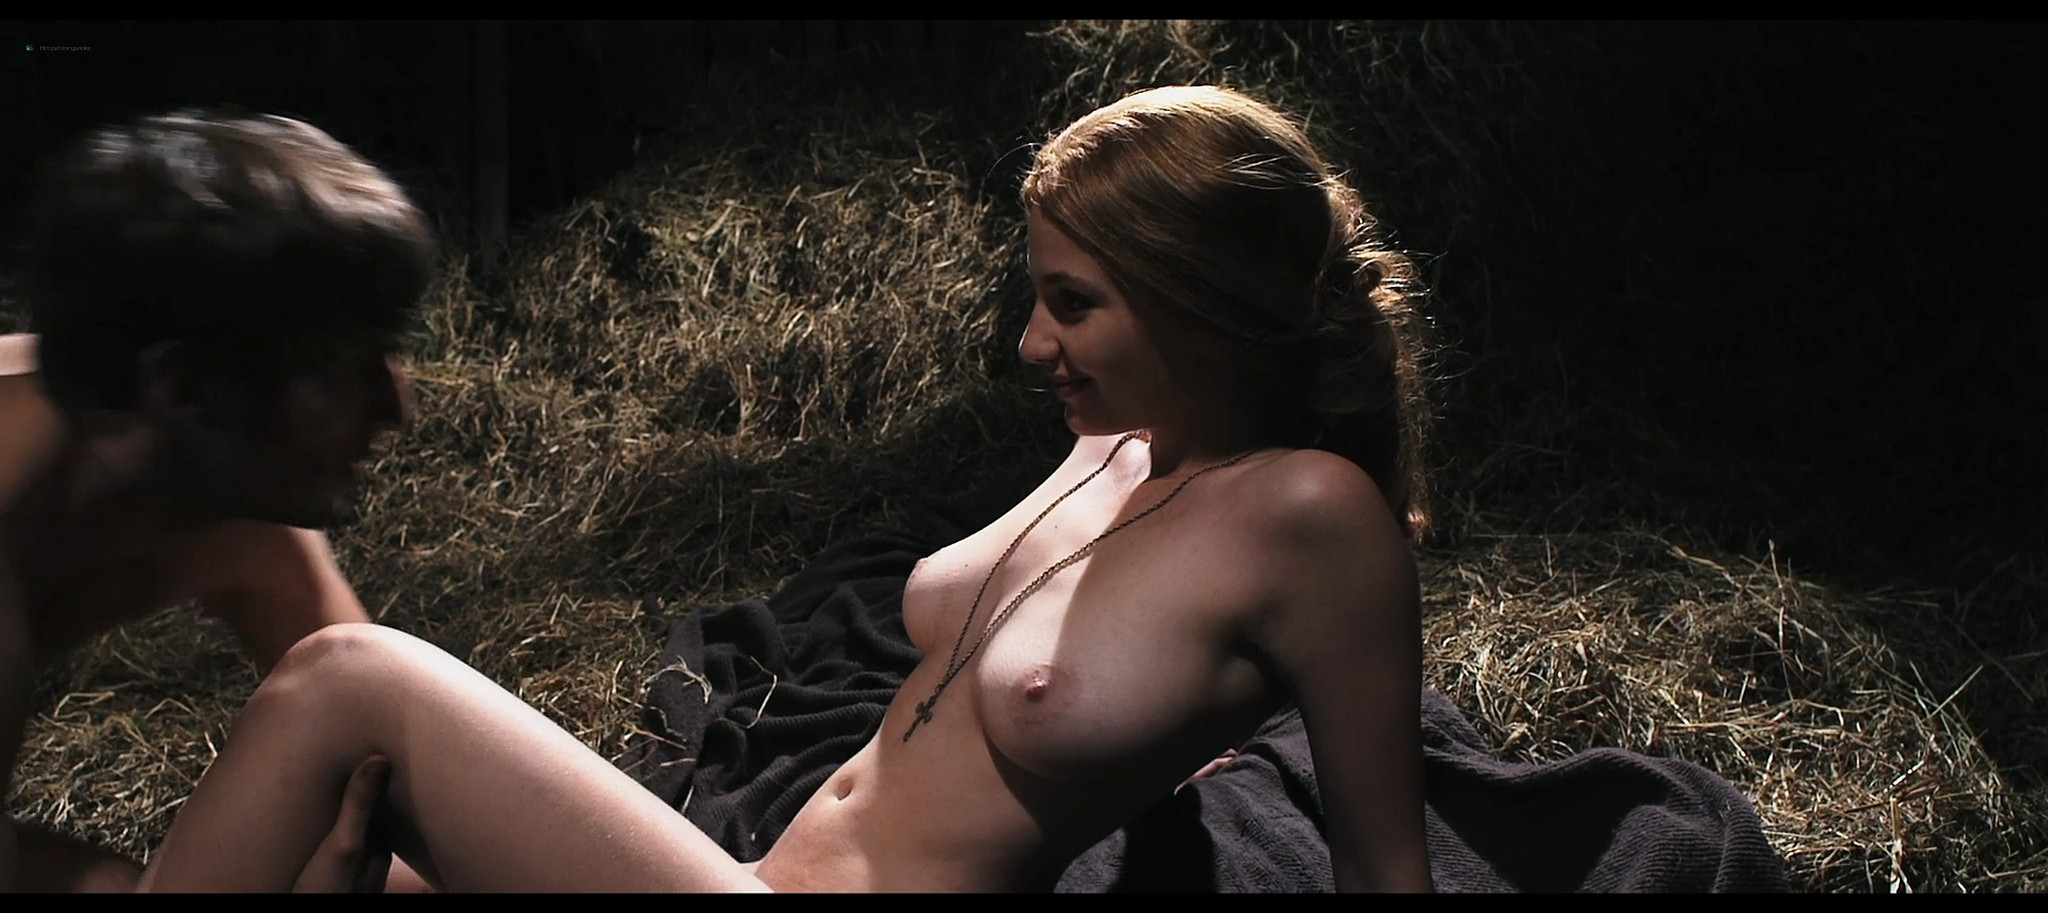 Asia Argento nude and Miriam Giovanelli nude in Darios Argento Dracula 3d 2012 HD 1080p BluRay